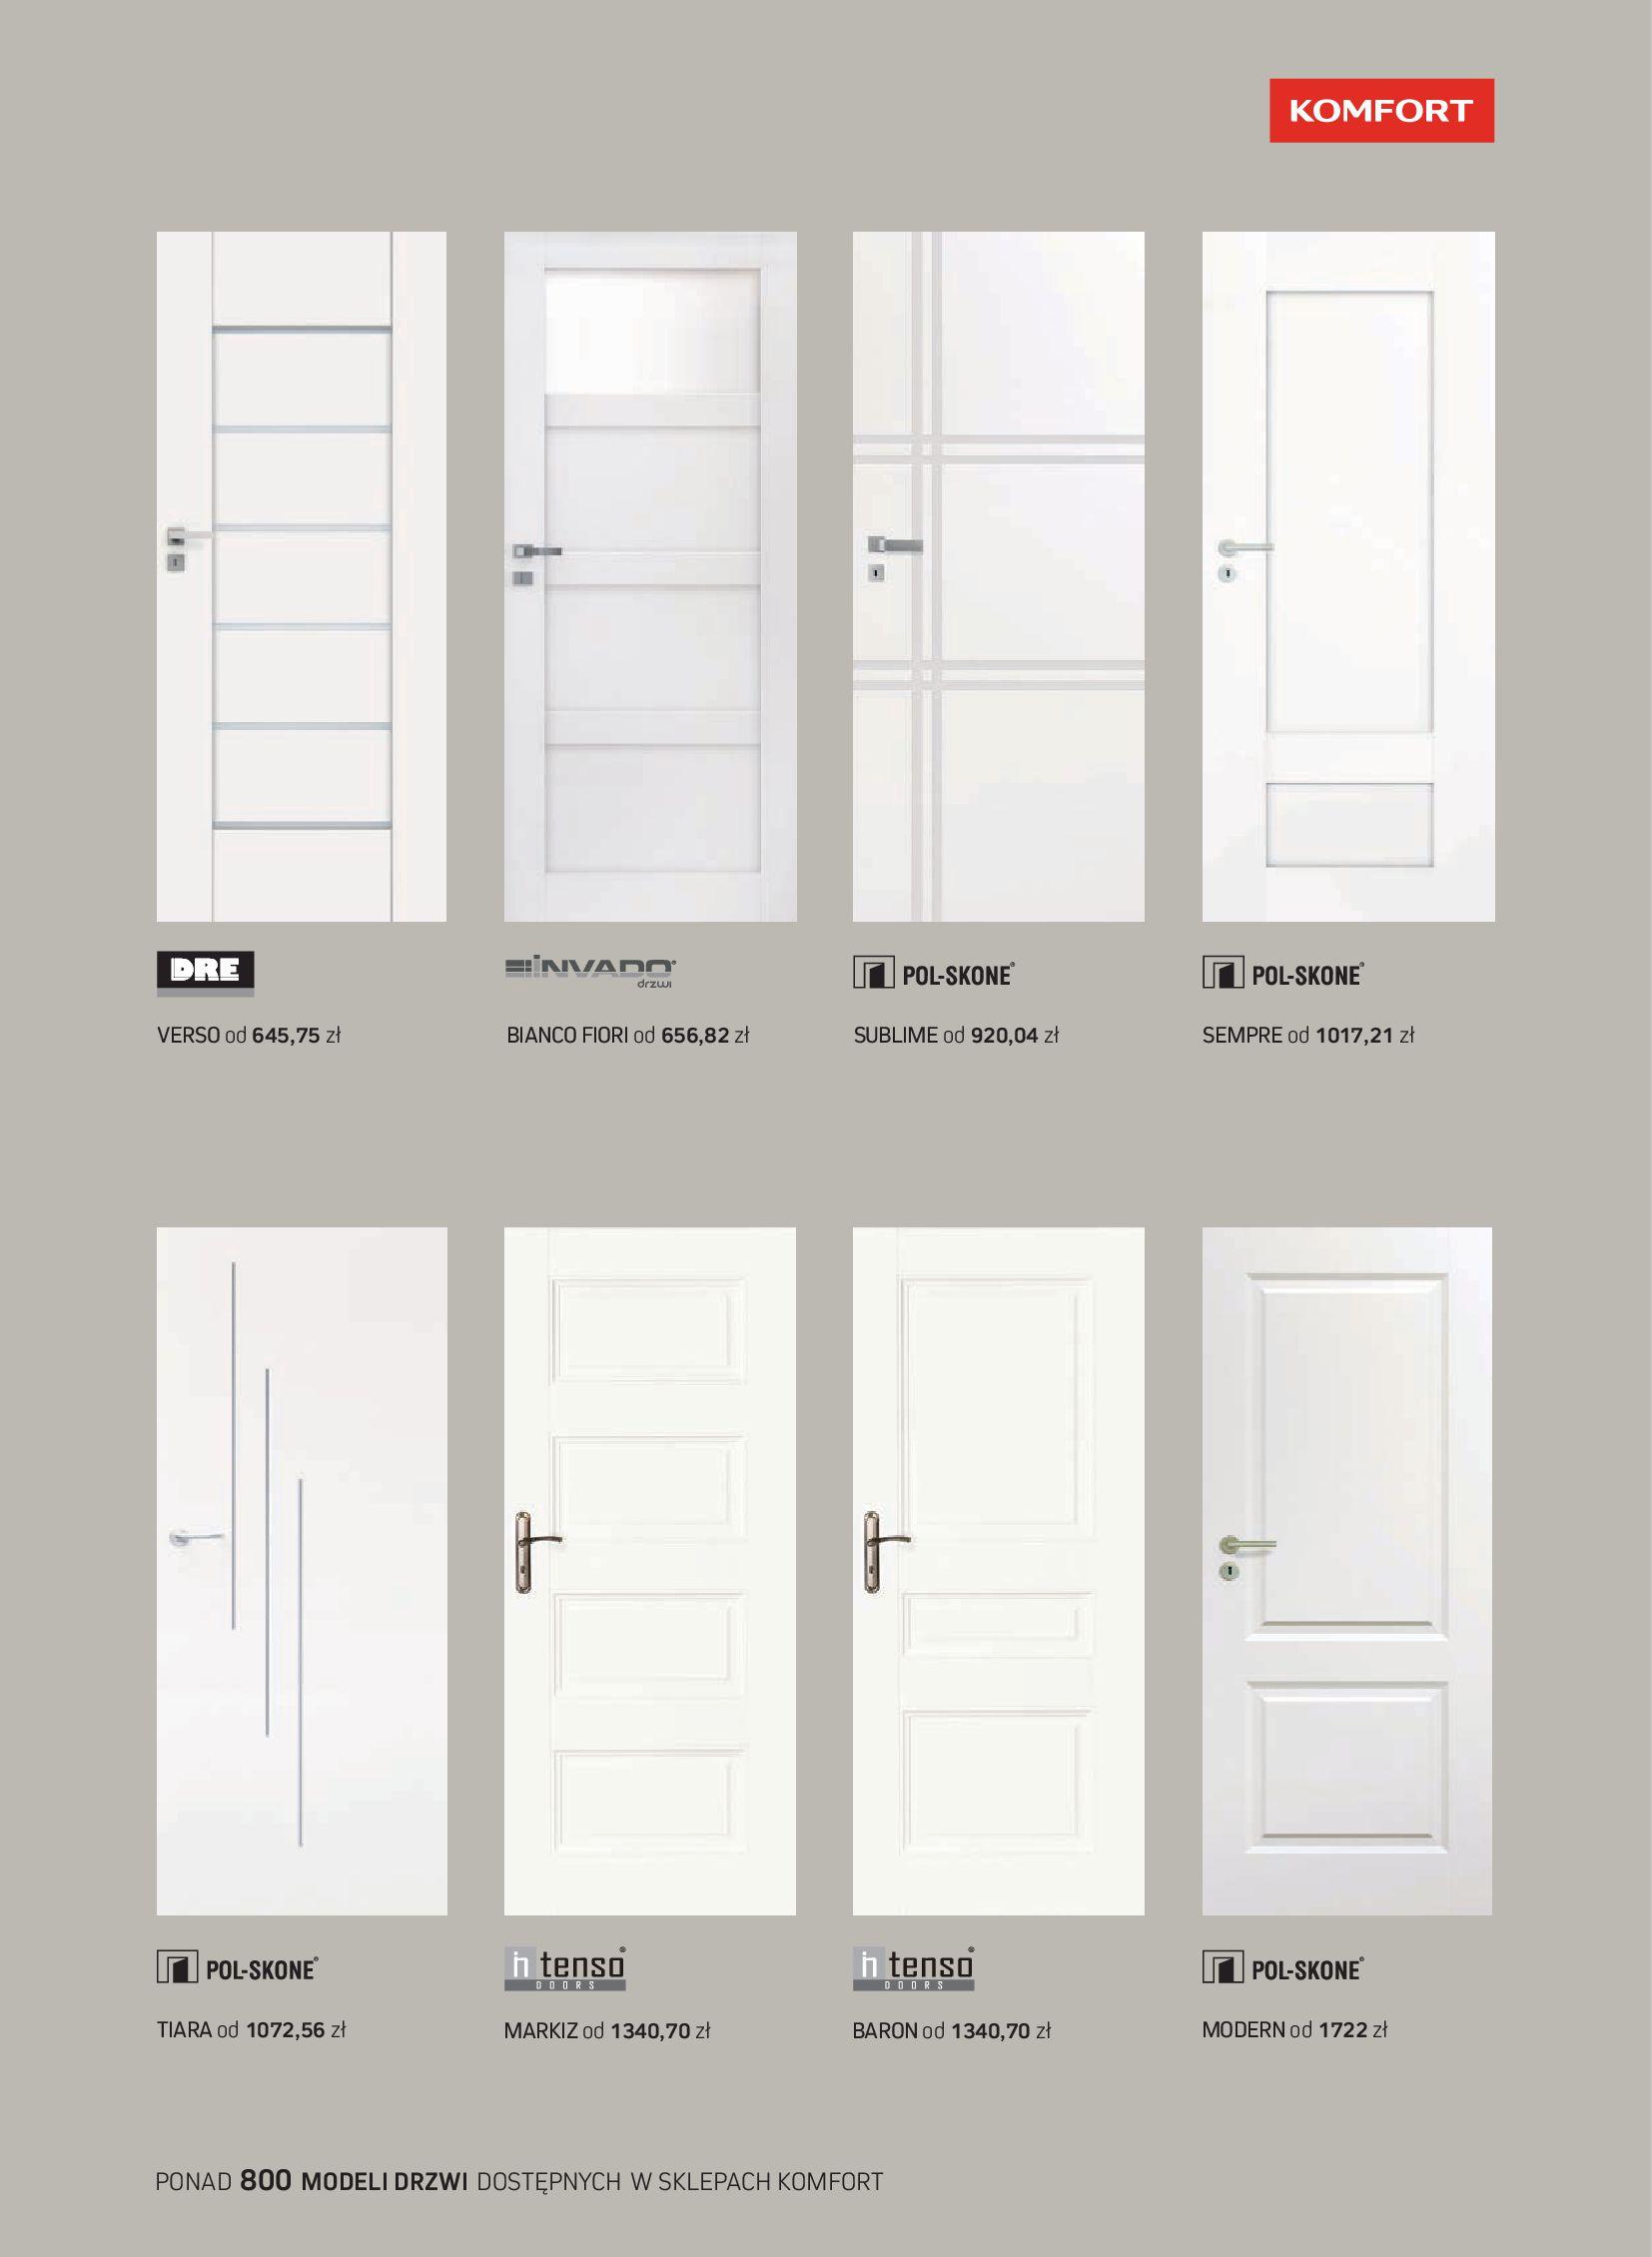 Gazetka Komfort: Gazetka Komfort - Katalog podłogi i drzwi 2021-06-16 page-55